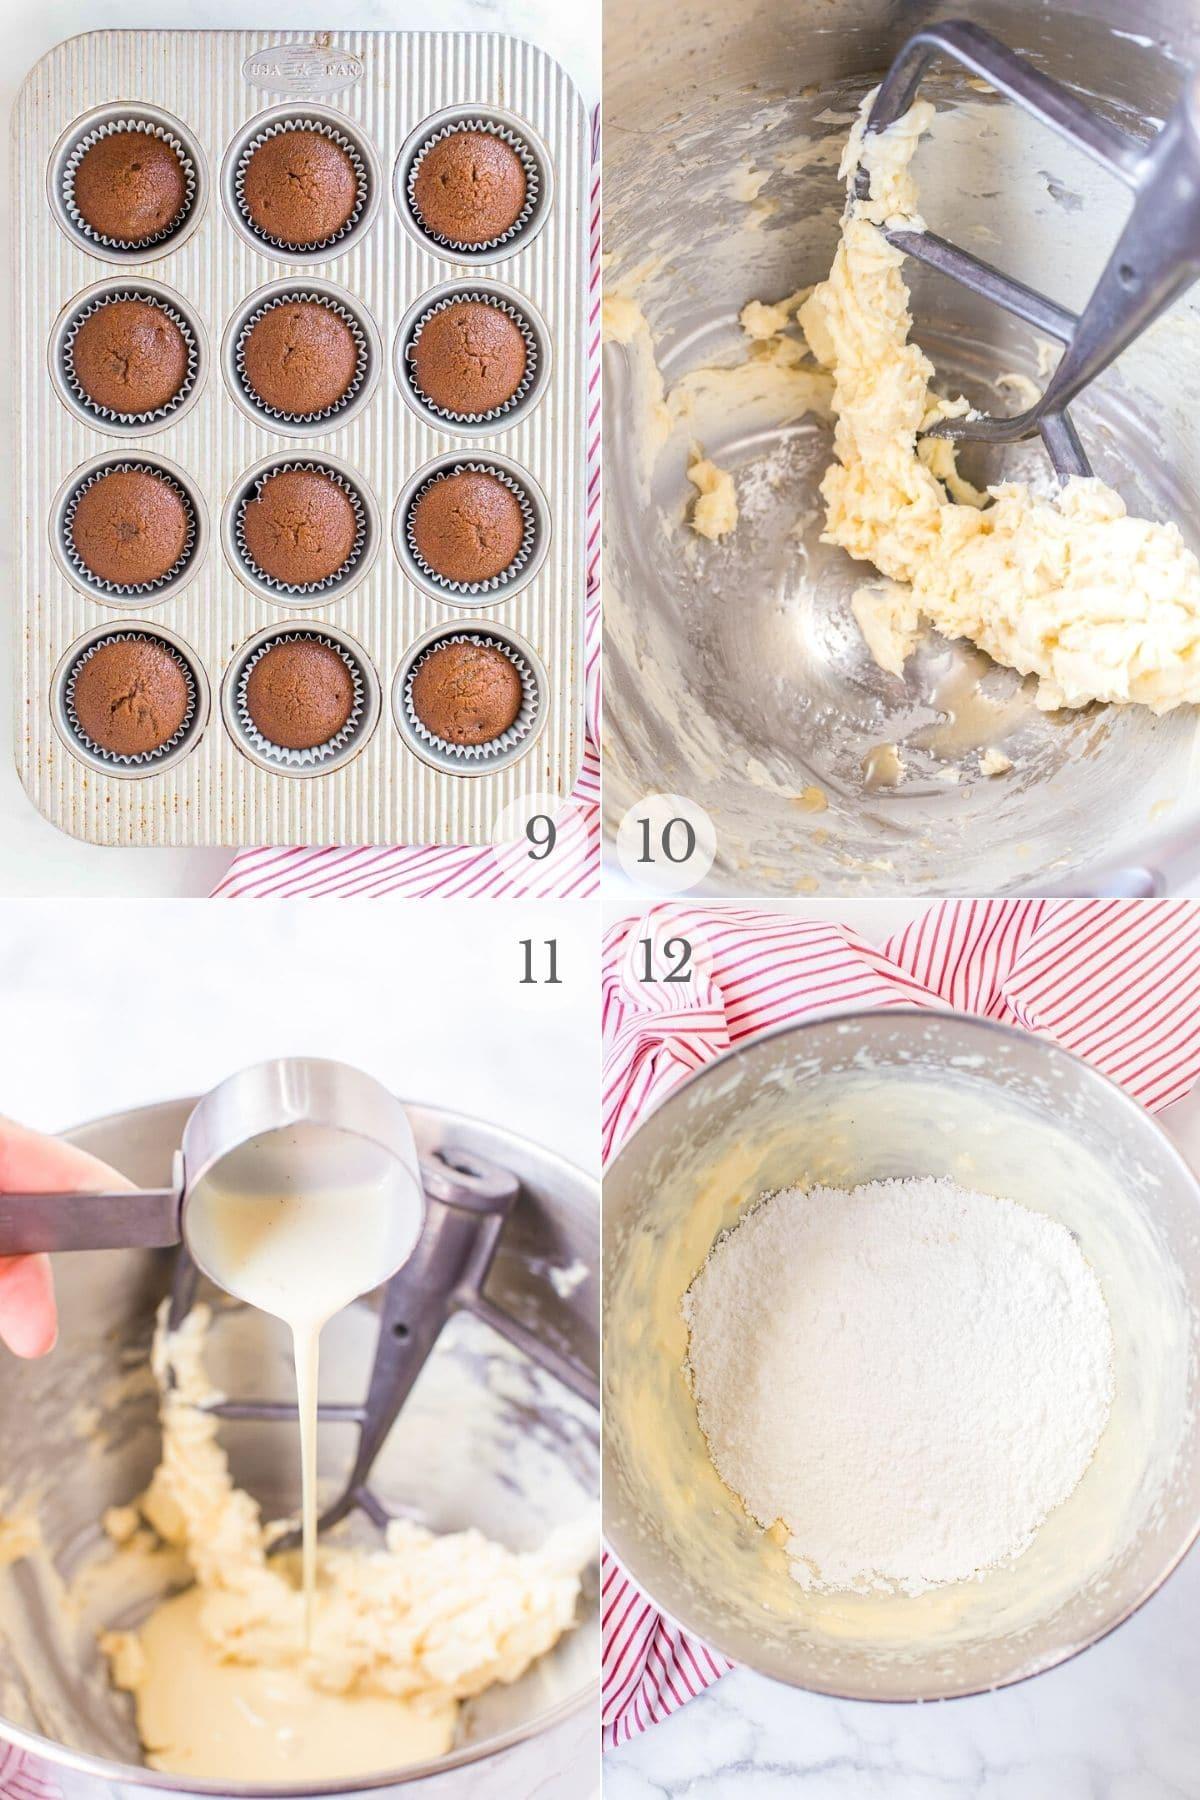 gingerbread cupcakes recipe steps 9-12